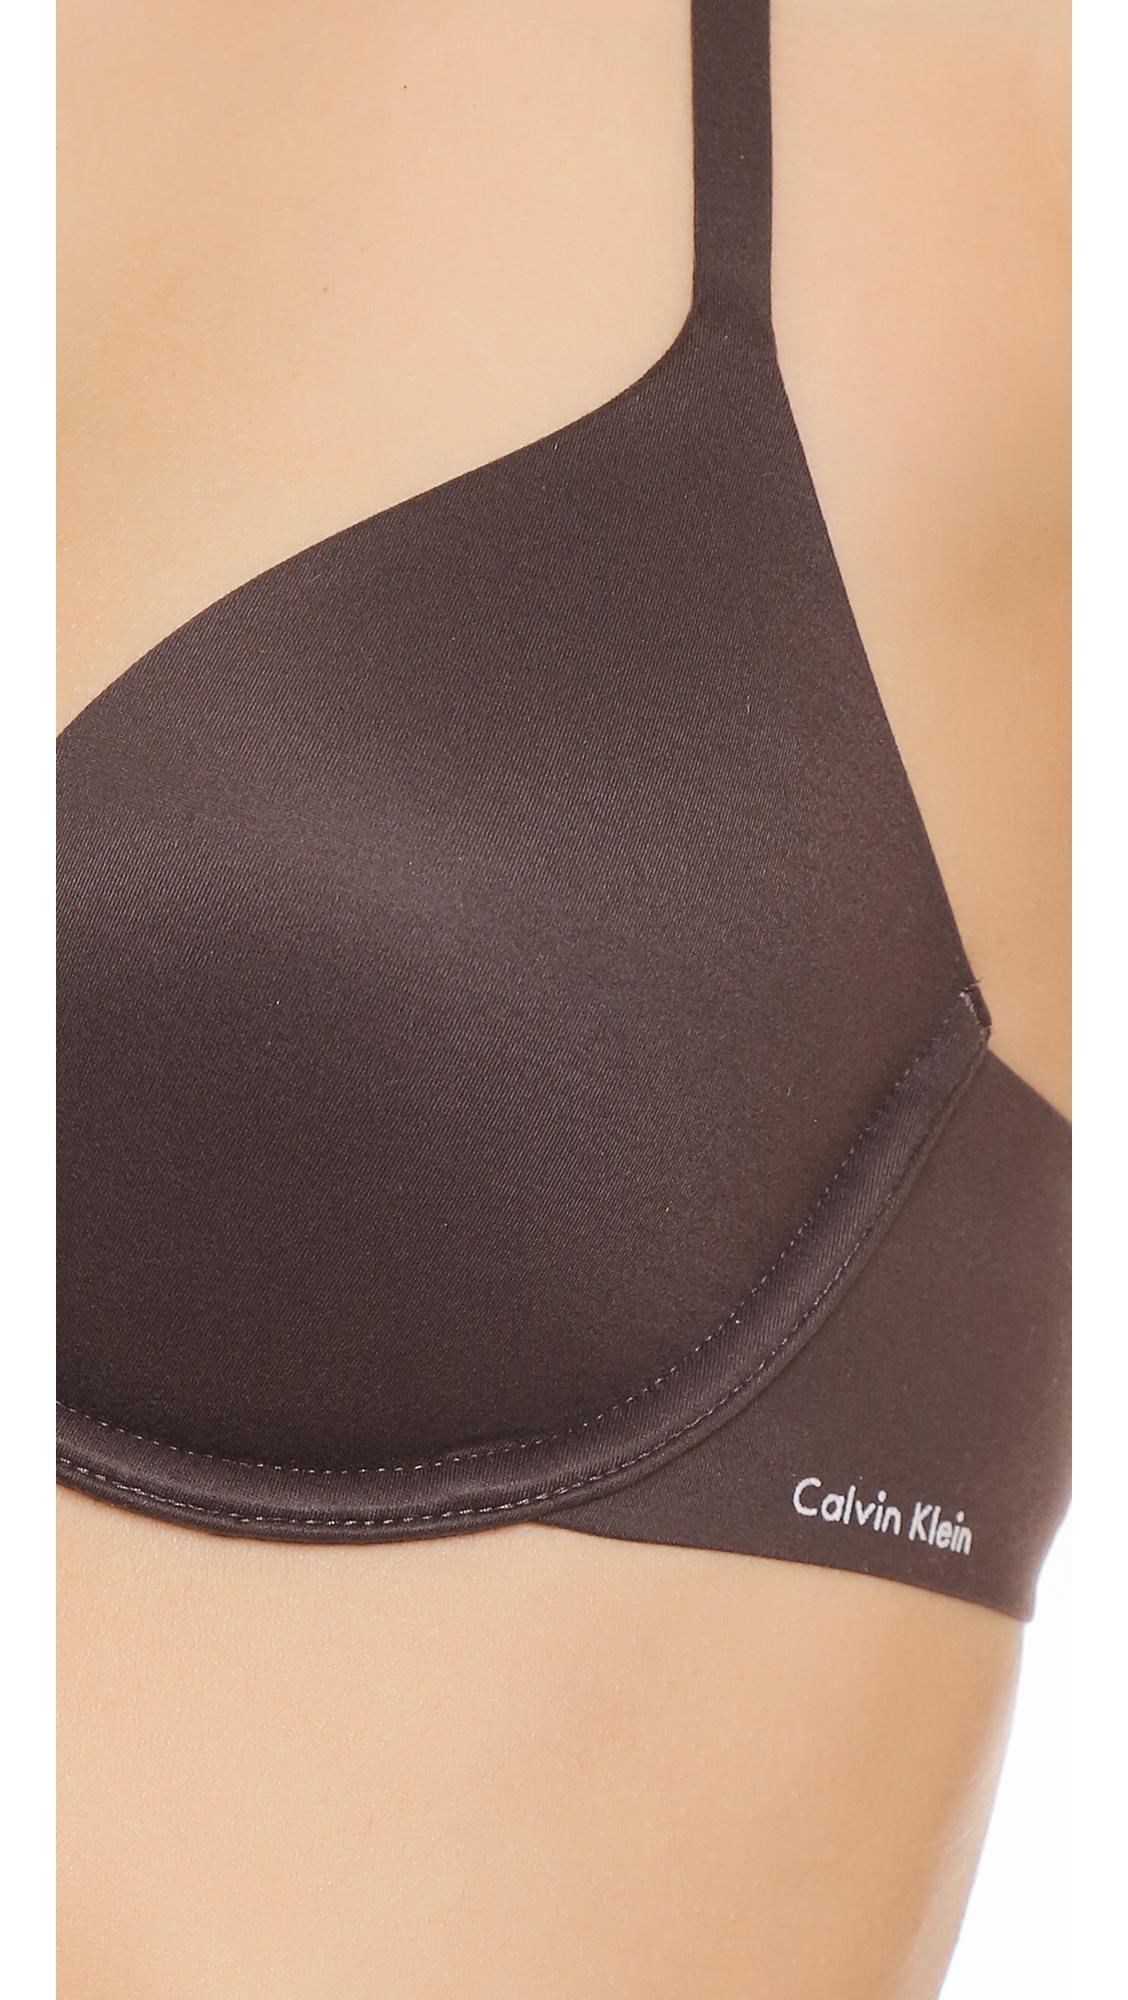 Kollette calvin klein underwear perfectly fit racer back for Racerback t shirt bra